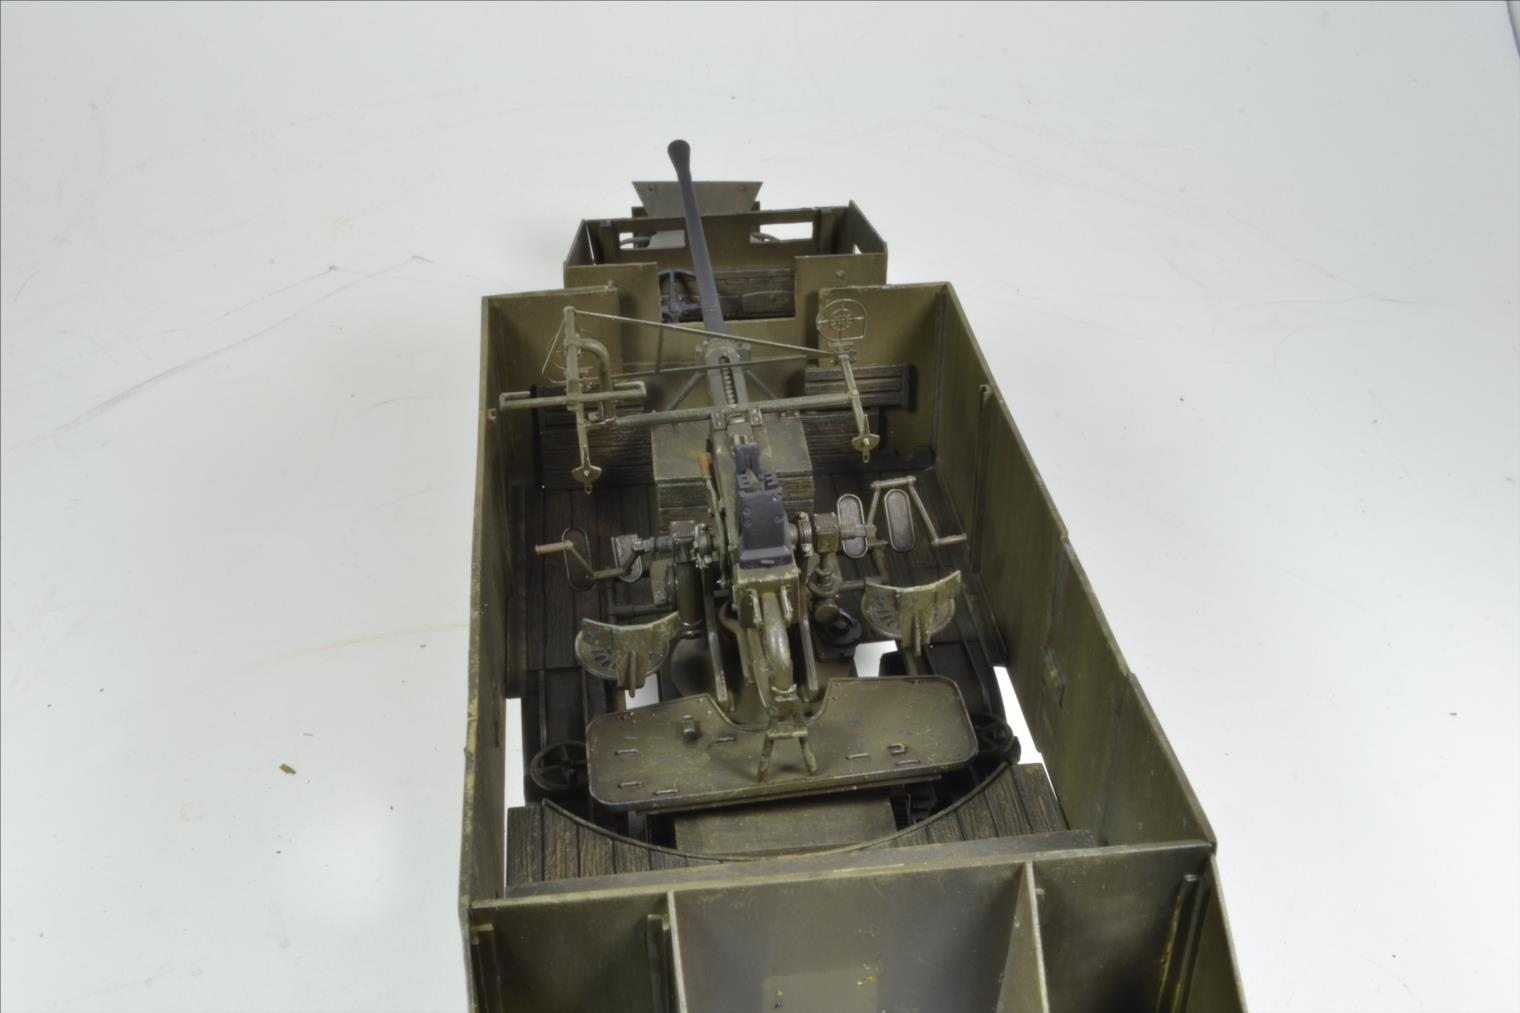 INDOCHINE GMC Bofors (Hobby Boss) 1/35 - Page 2 19122109485022494216568060